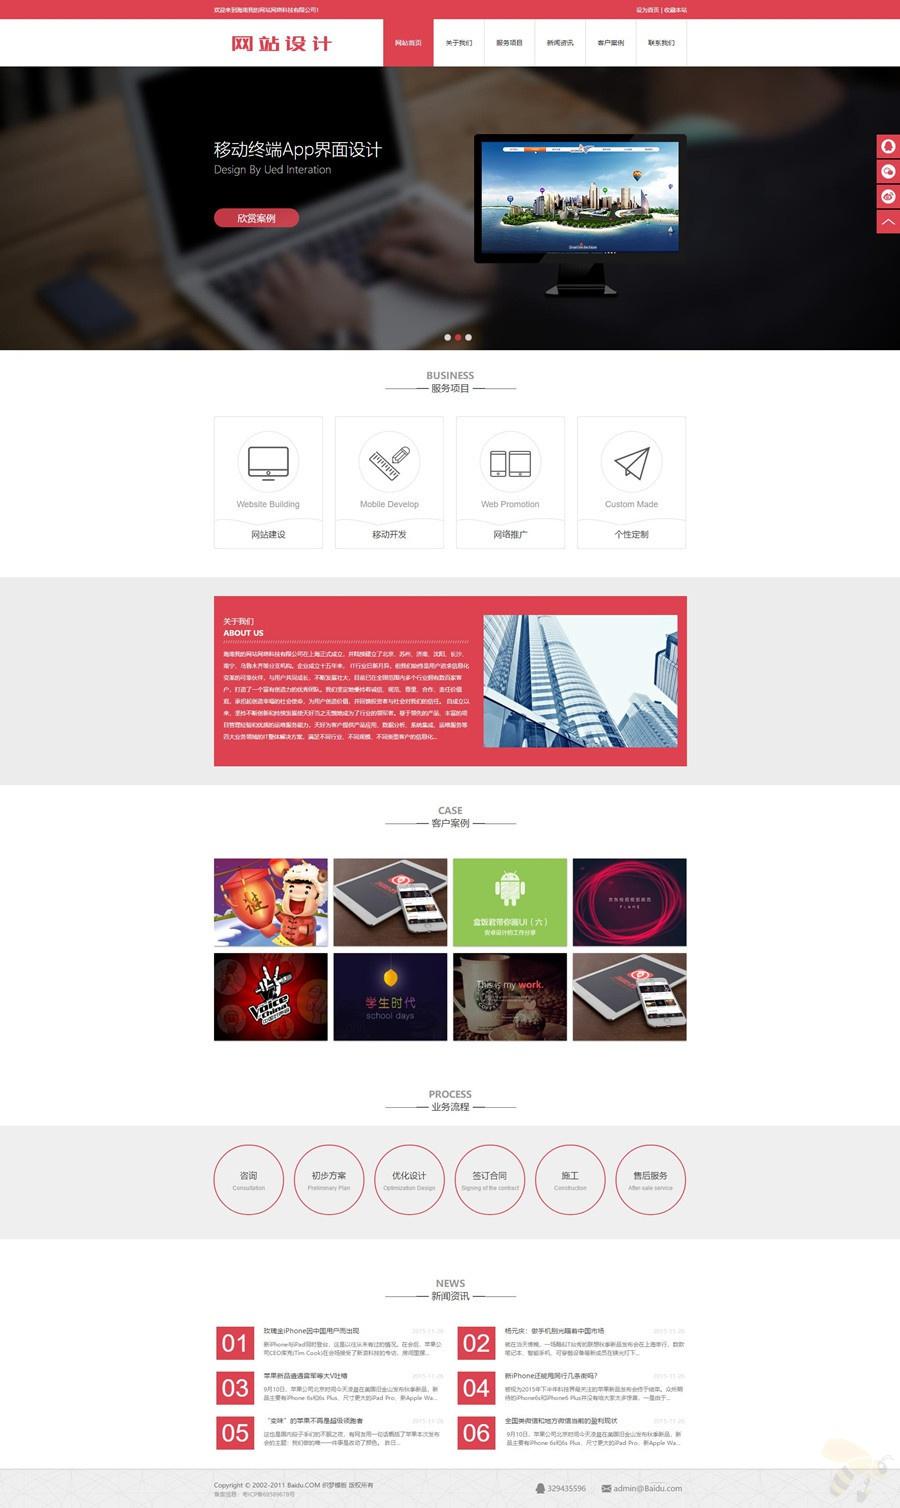 dedecms织梦模板高端html5网络工作室团队设计公司模板